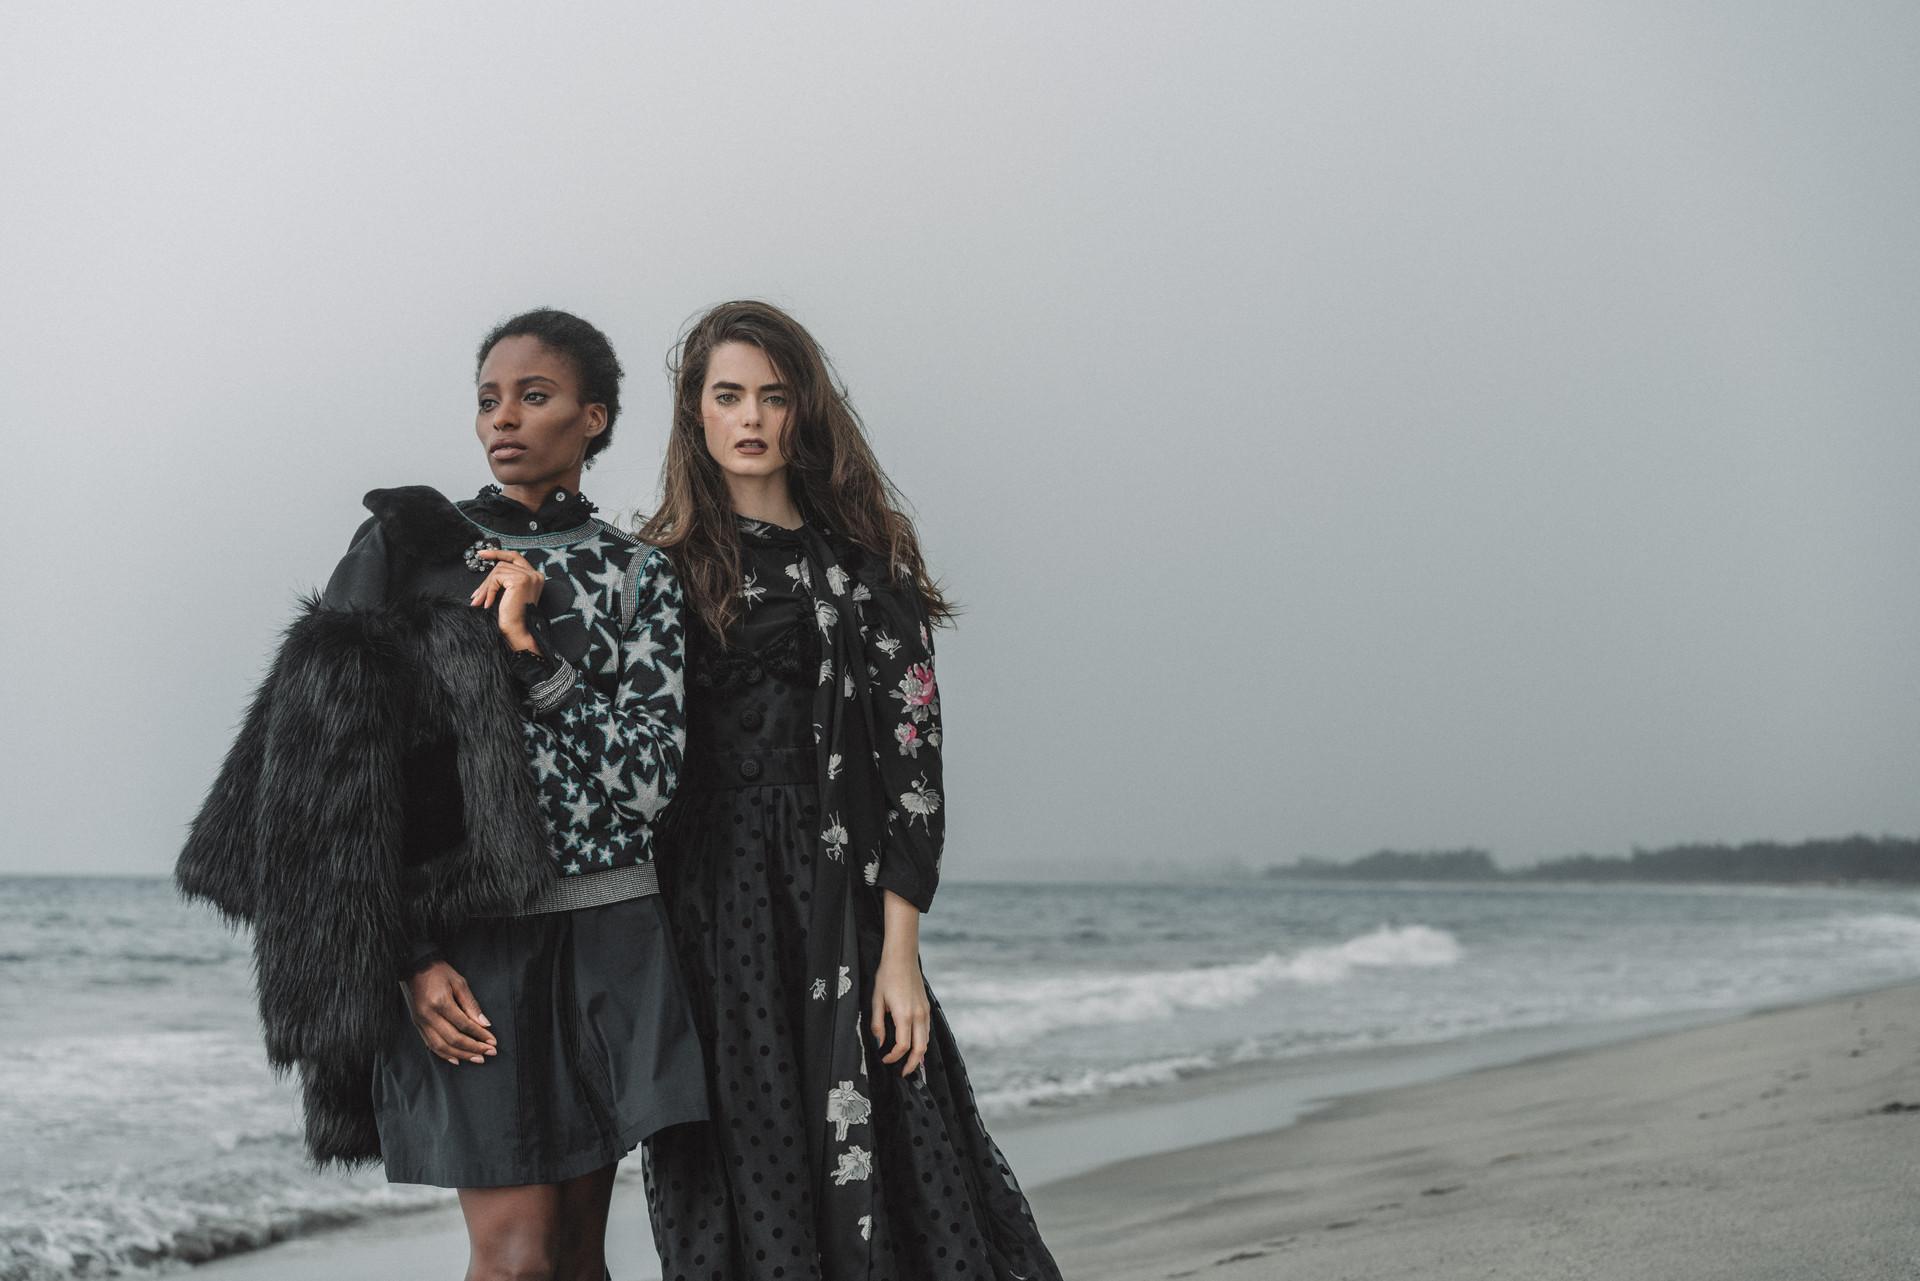 Photographer: Artu Nepomuceno Stylist: Meg Manzano Hairstylist: Carlo Umipig Model: Eunique of Elite Models Manila and Bronija Ales For L'Officiel Philippines